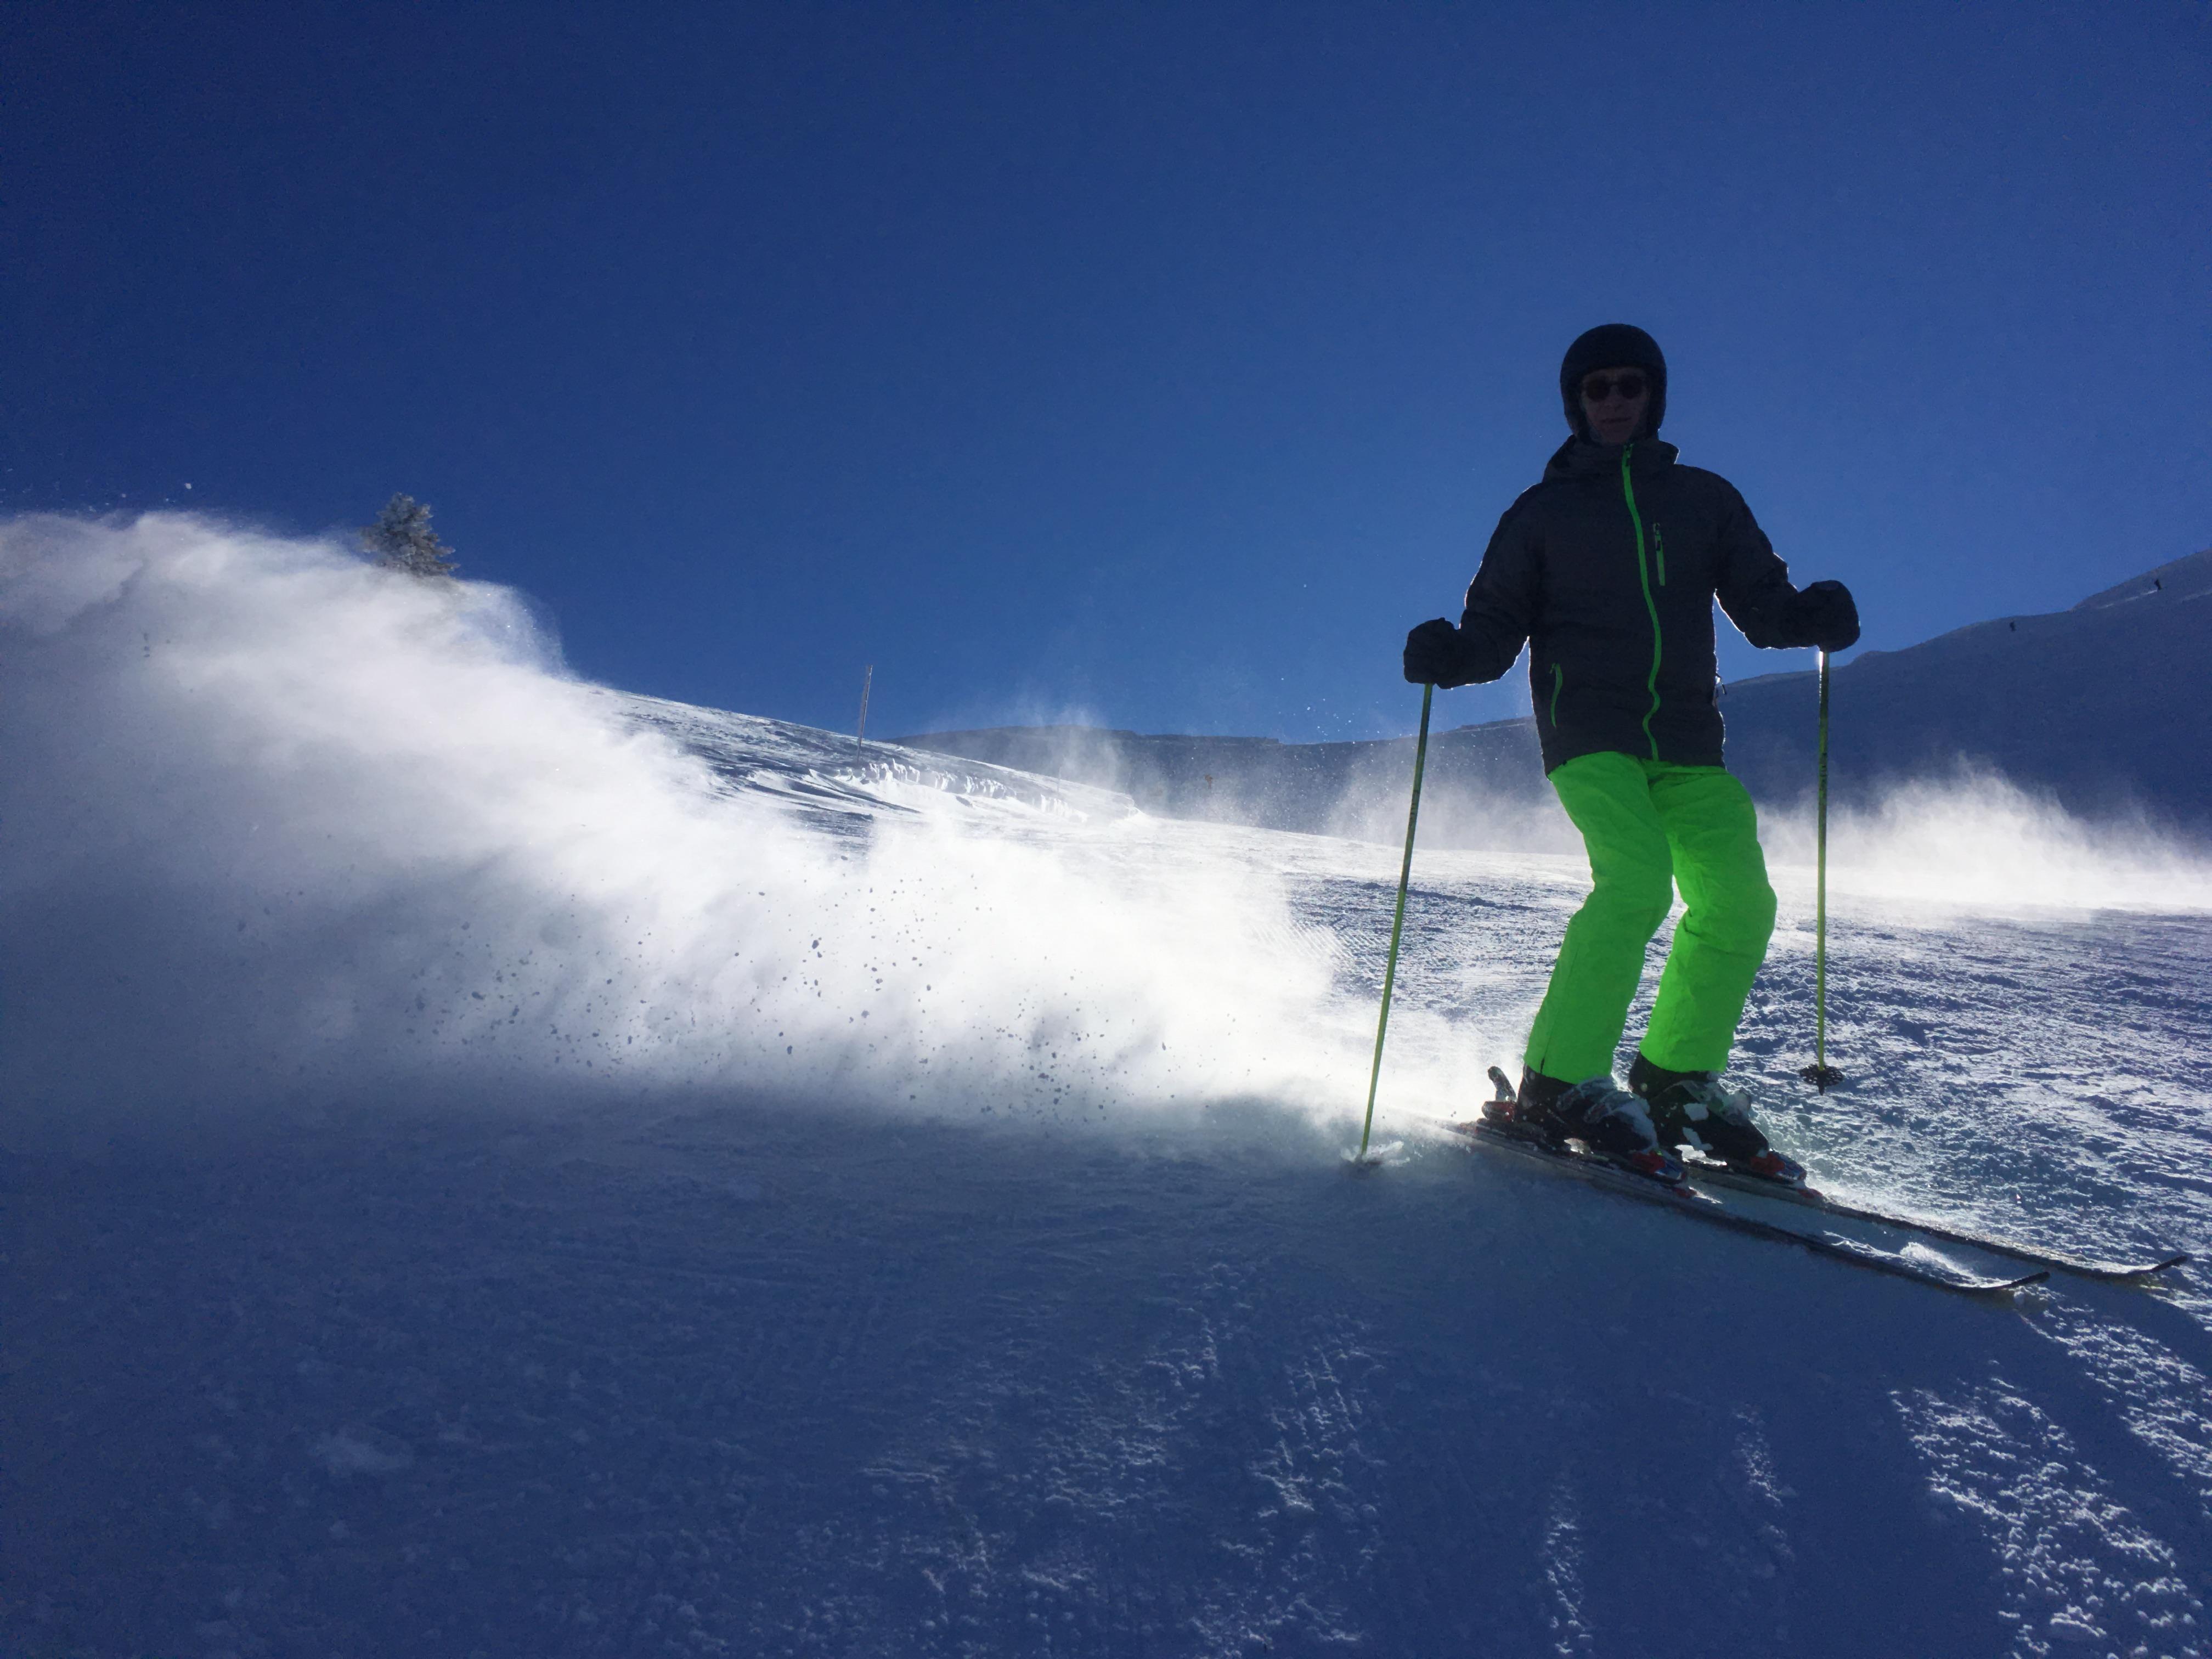 Late afternoon, Kalavryta Ski Resort